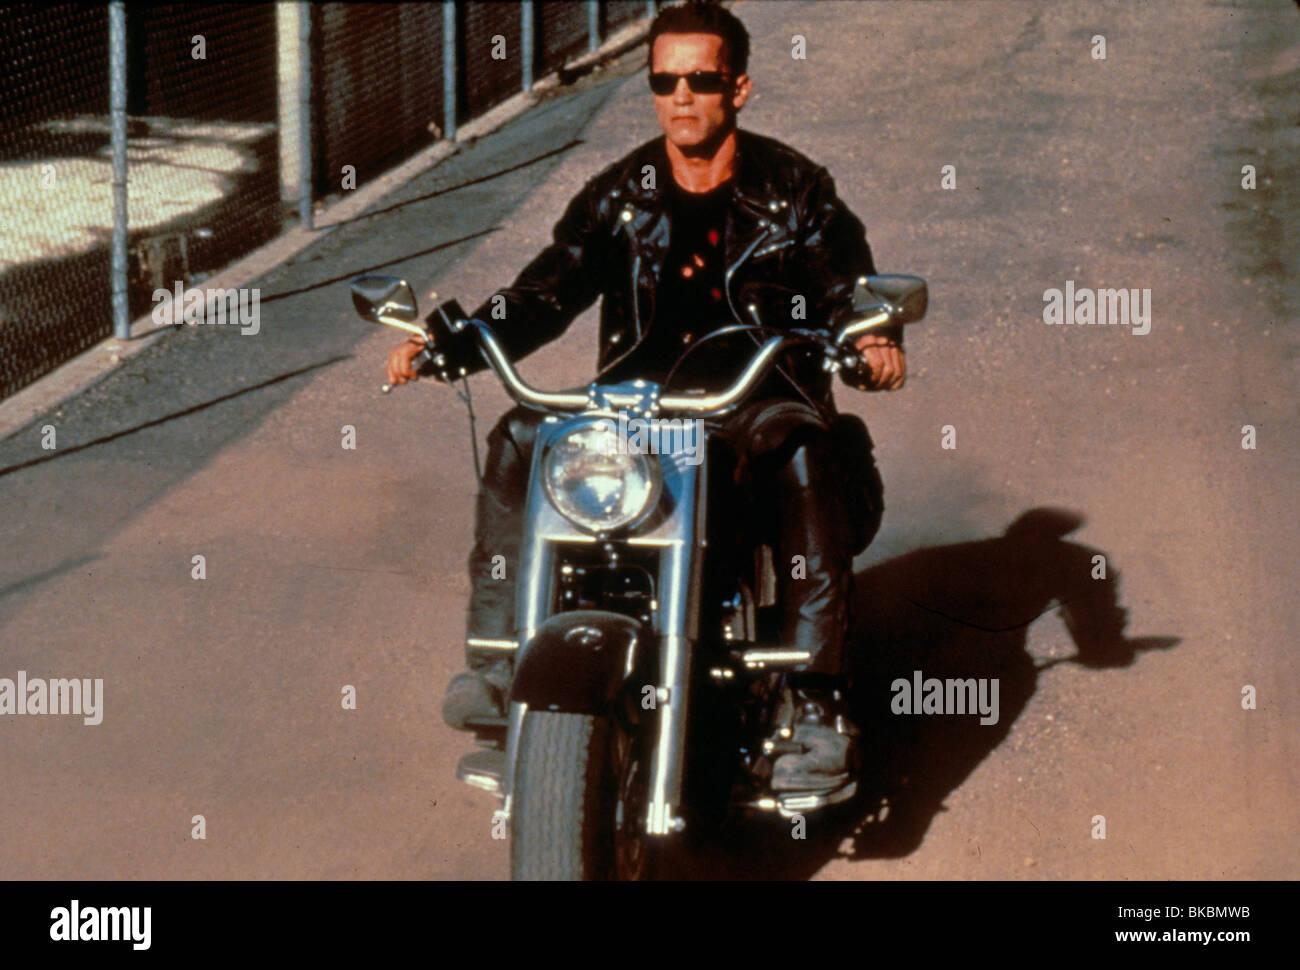 TERMINATOR 2: JUDGEMENT DAY (1991) ARNOLD SCHWARZENEGGER TR2 059 Stock Photo, Royalty Free Image ...